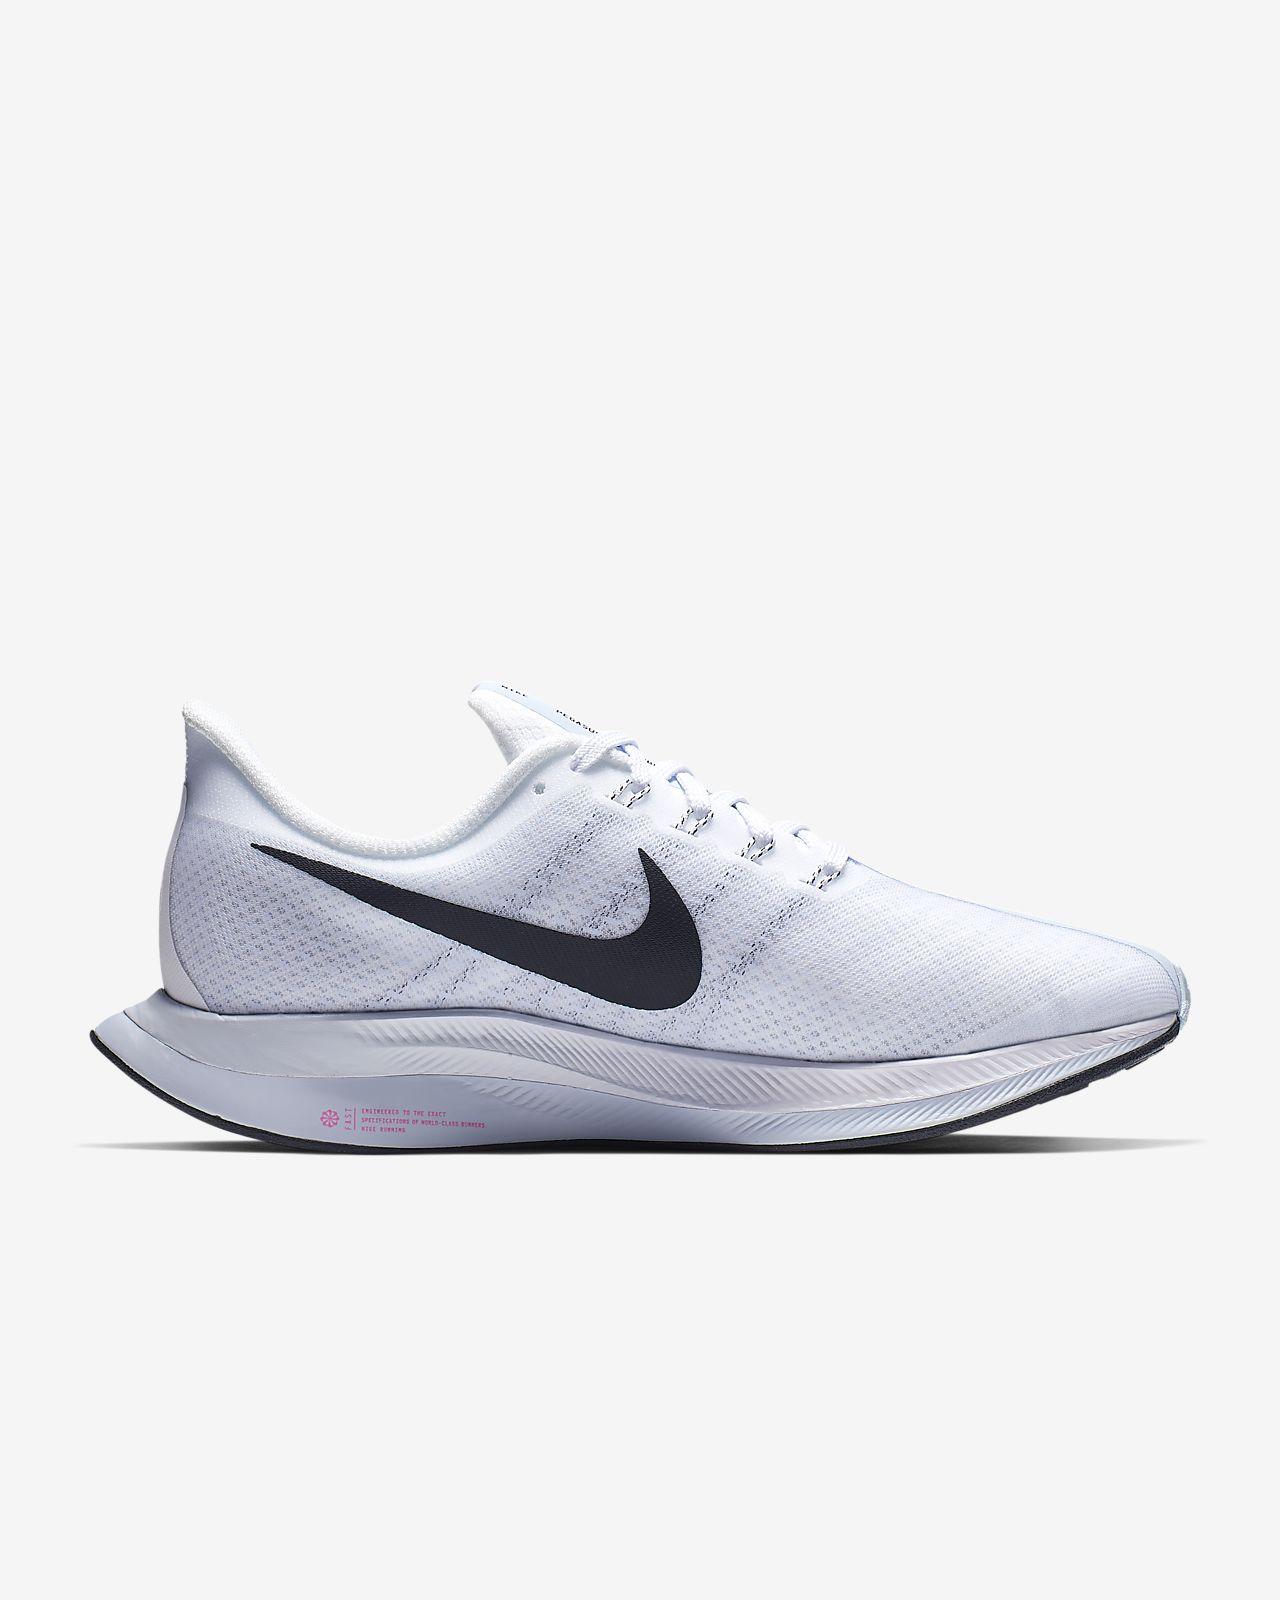 957e00c319e Nike Zoom Pegasus Turbo Women s Running Shoe. Nike.com AU